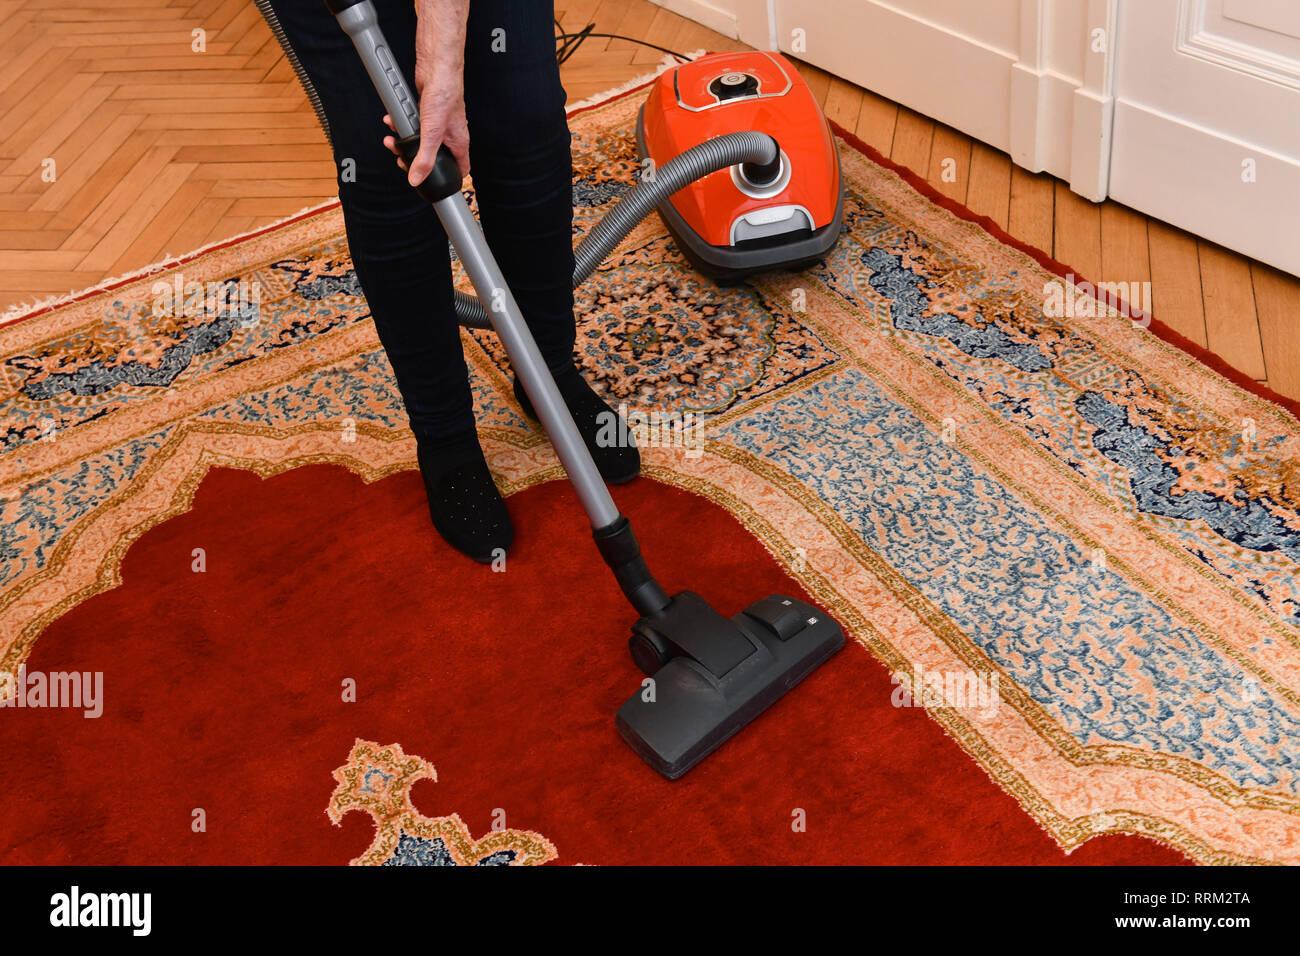 Hoovering, carpet, housework, Staubsaugen, Teppich, Hausarbeit Stock Photo